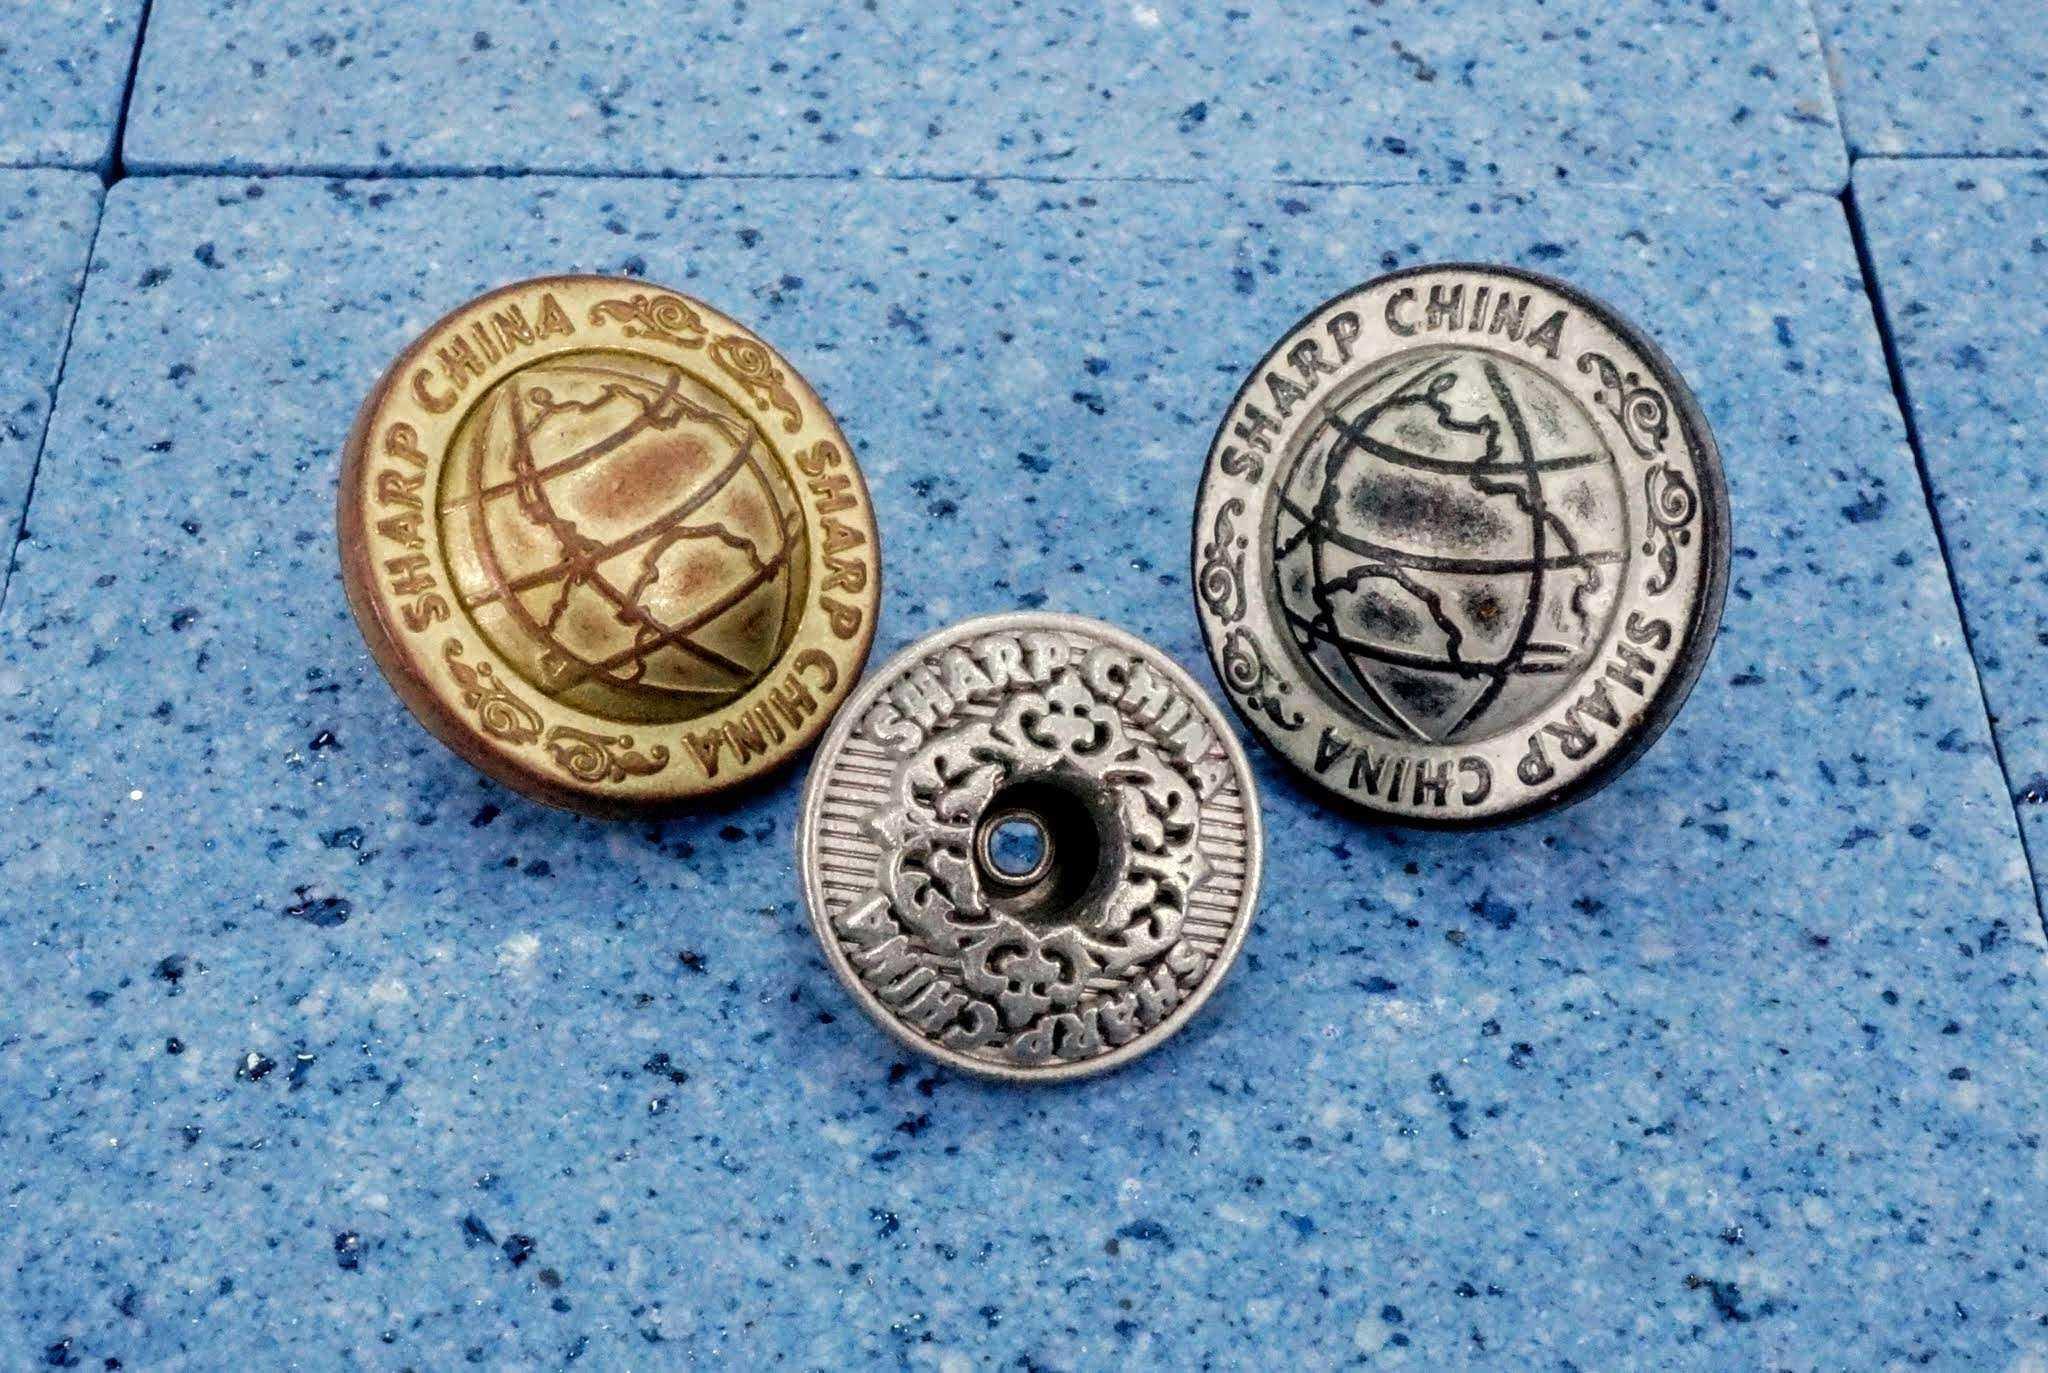 Sharp China Buttons & Trimming Co ,ltd  - Hong Kong (SAR